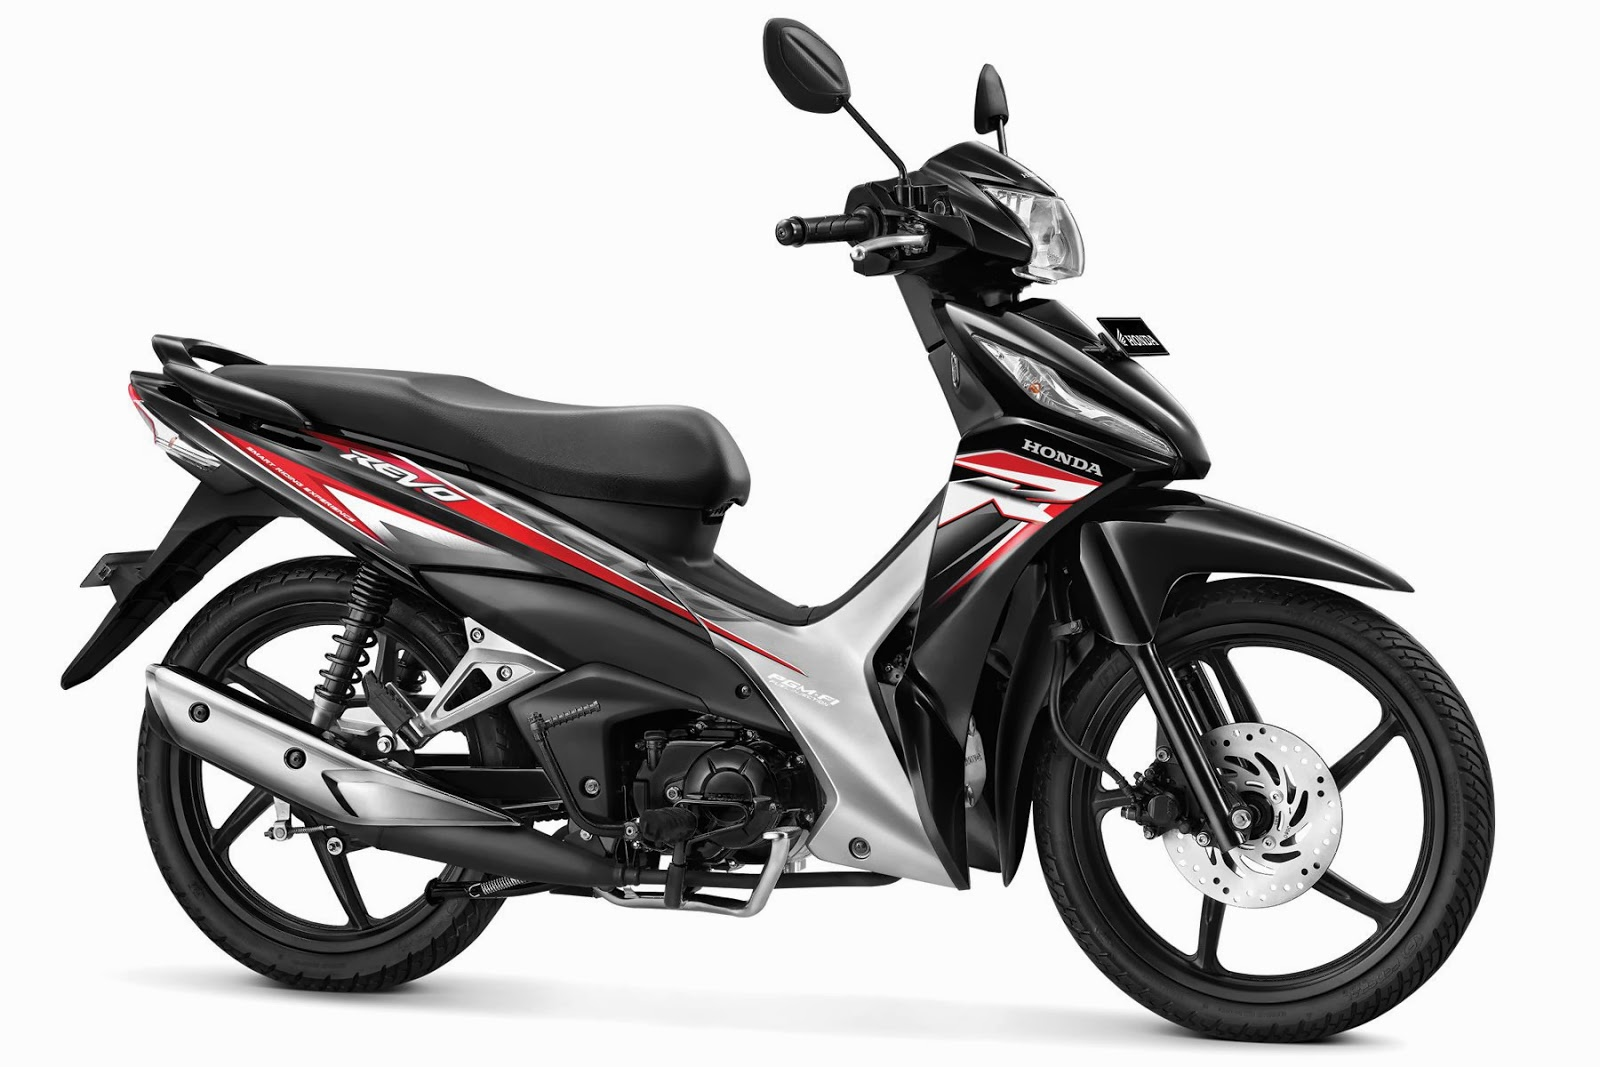 Yamaha Mio Mx 125 Wiring Diagram 7 Way Bargman Plug New Fino Fi 2014 2015 Autos Post